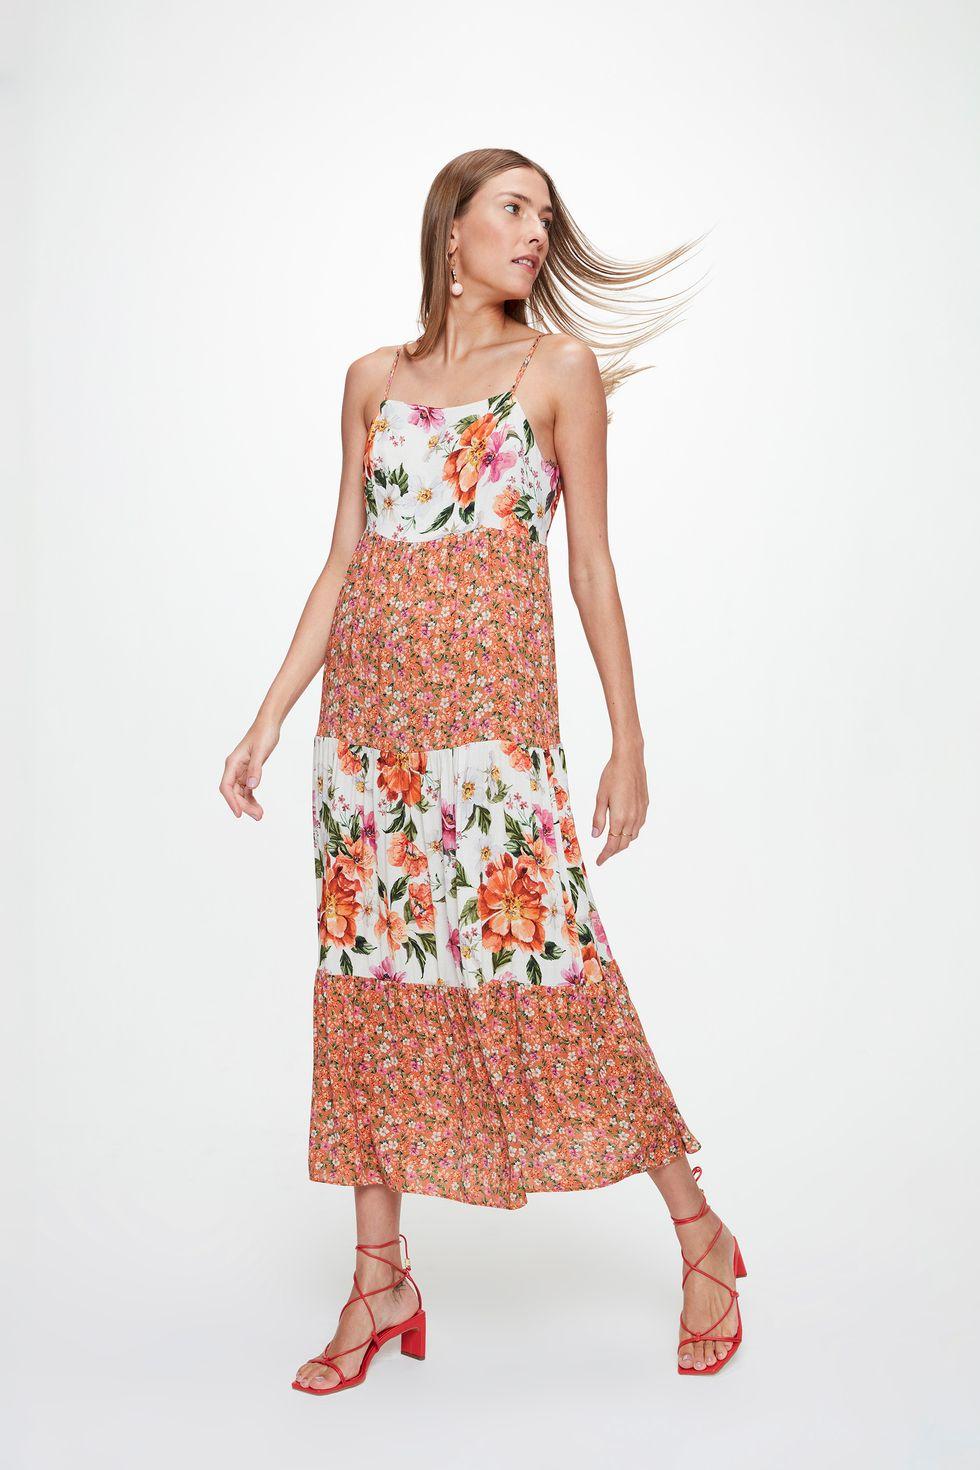 Vestido-Midi-Recortes-Mix-Florais-Detalhe--